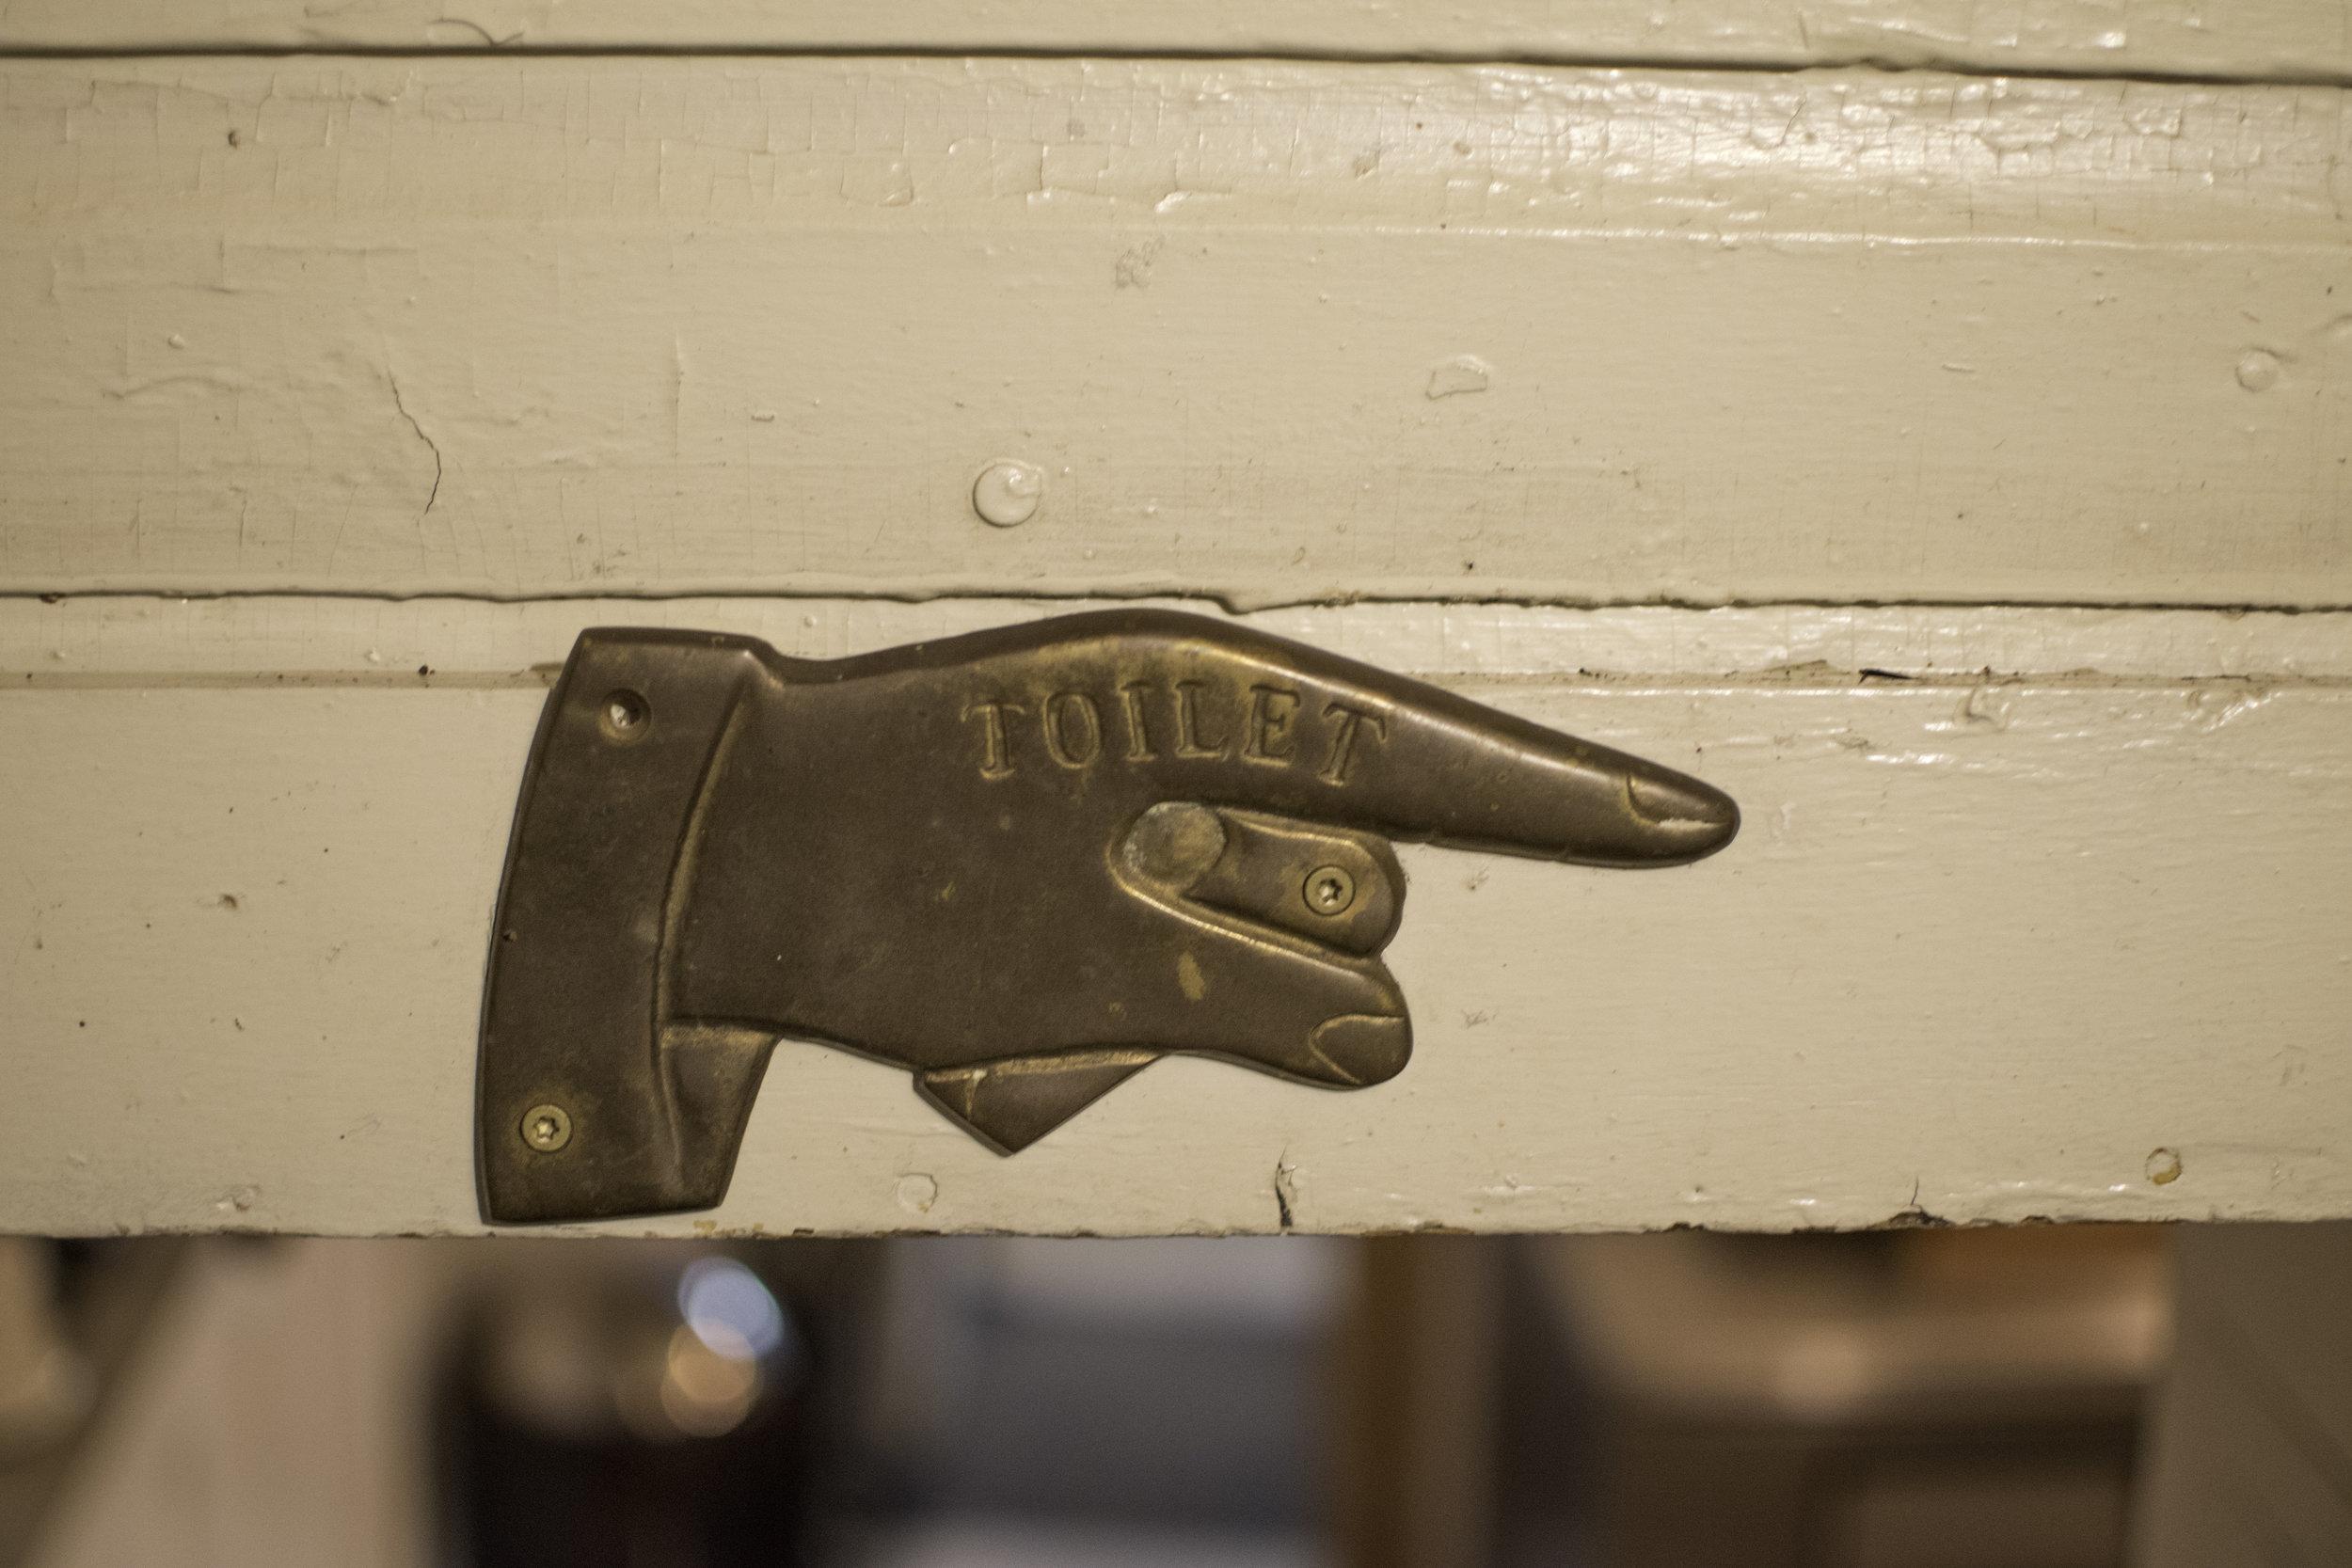 toilet hand.jpg